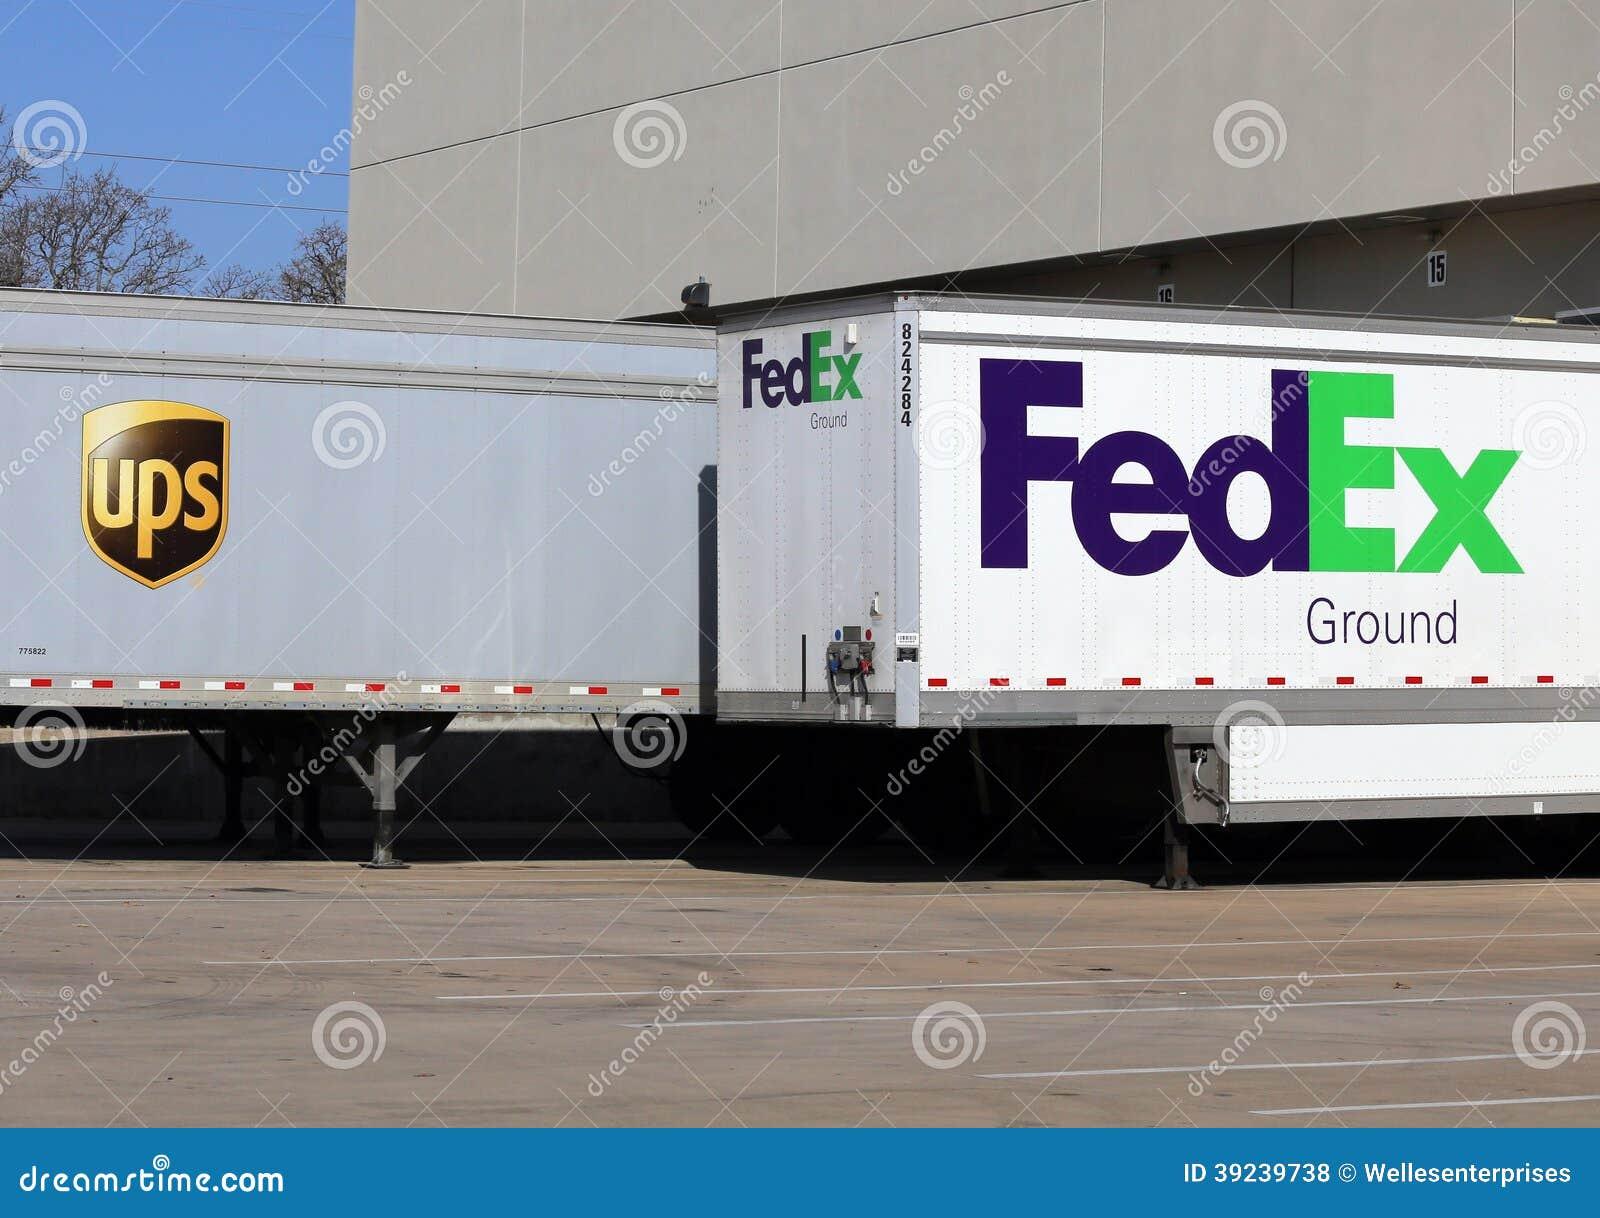 UPS Vs Fedex Editorial Stock Photo - Image: 39239738